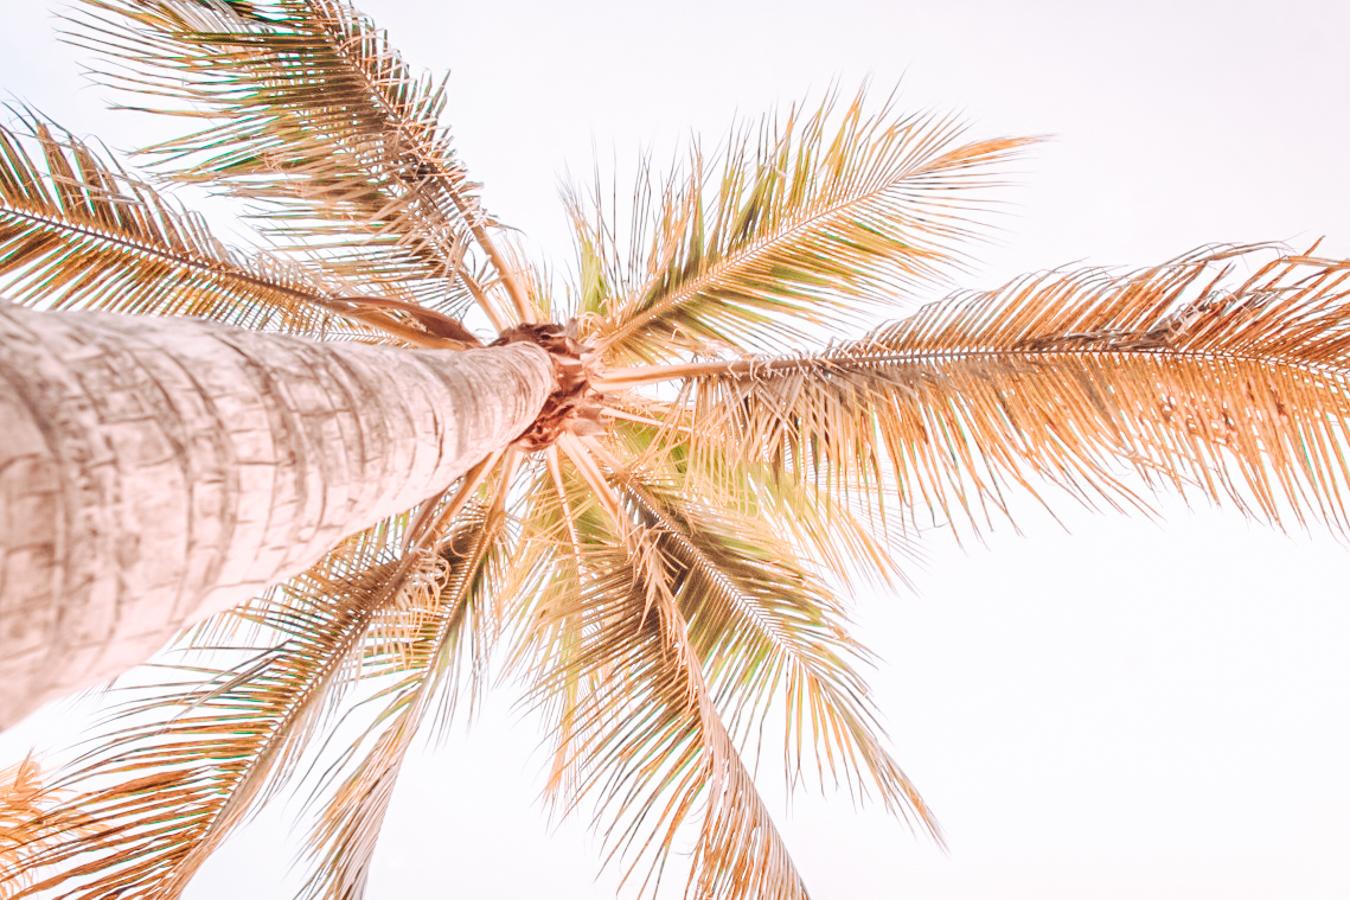 Palm tree from below